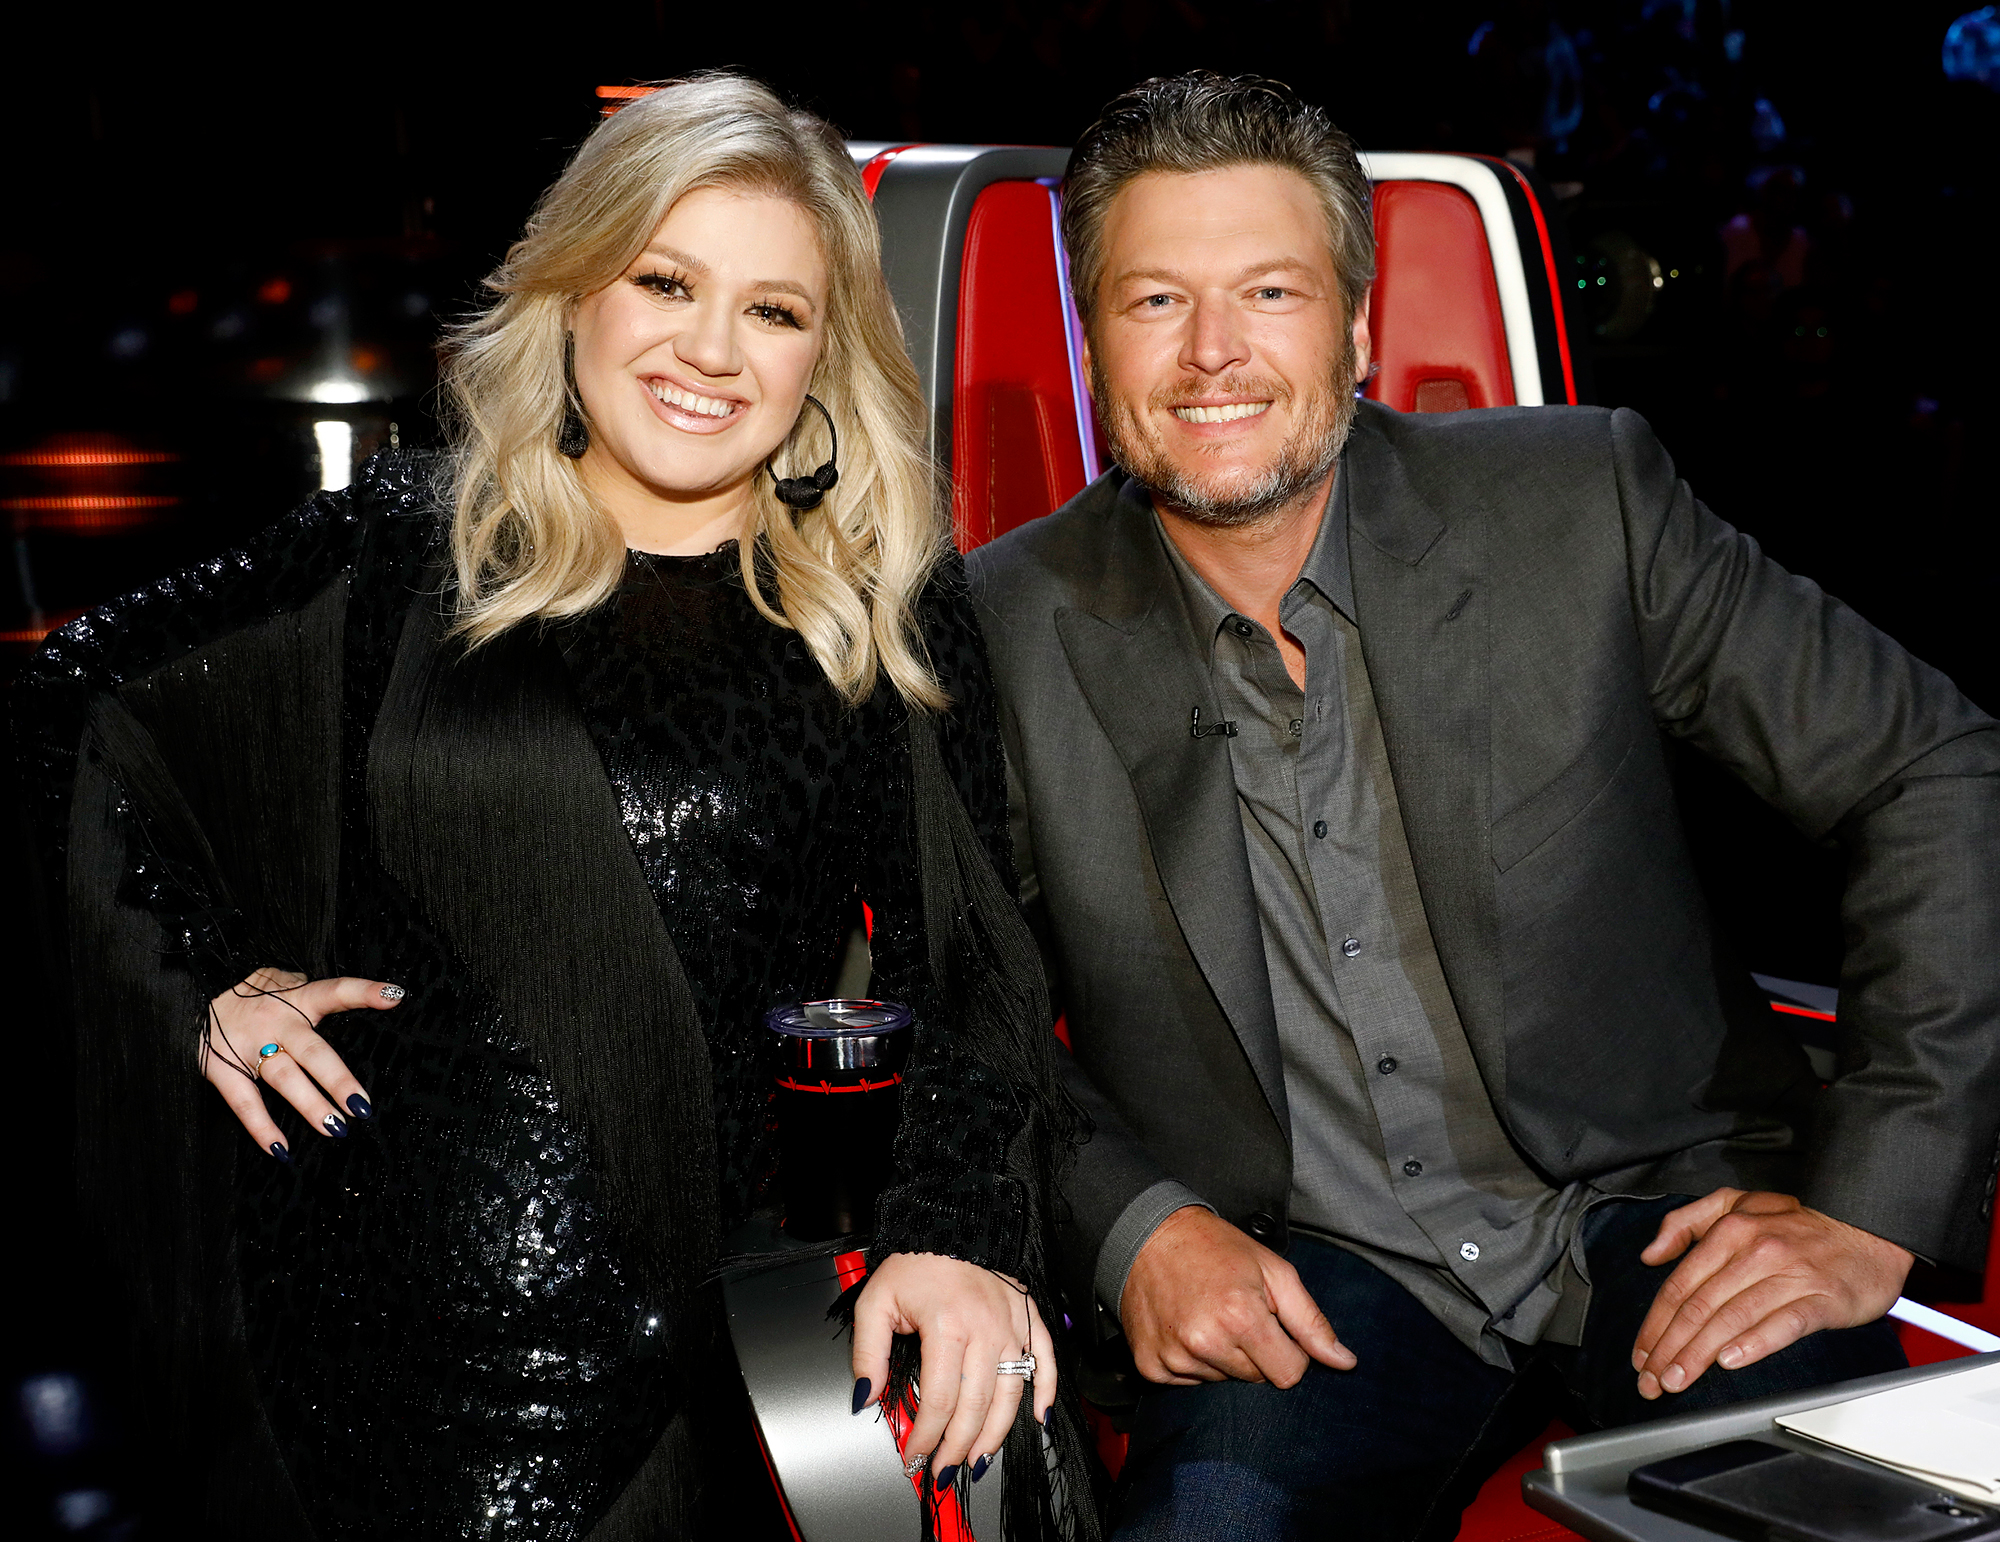 Kelly Clarkson Trolls Blake Shelton - Kelly Clarkson and Blake Shelton on The Voice